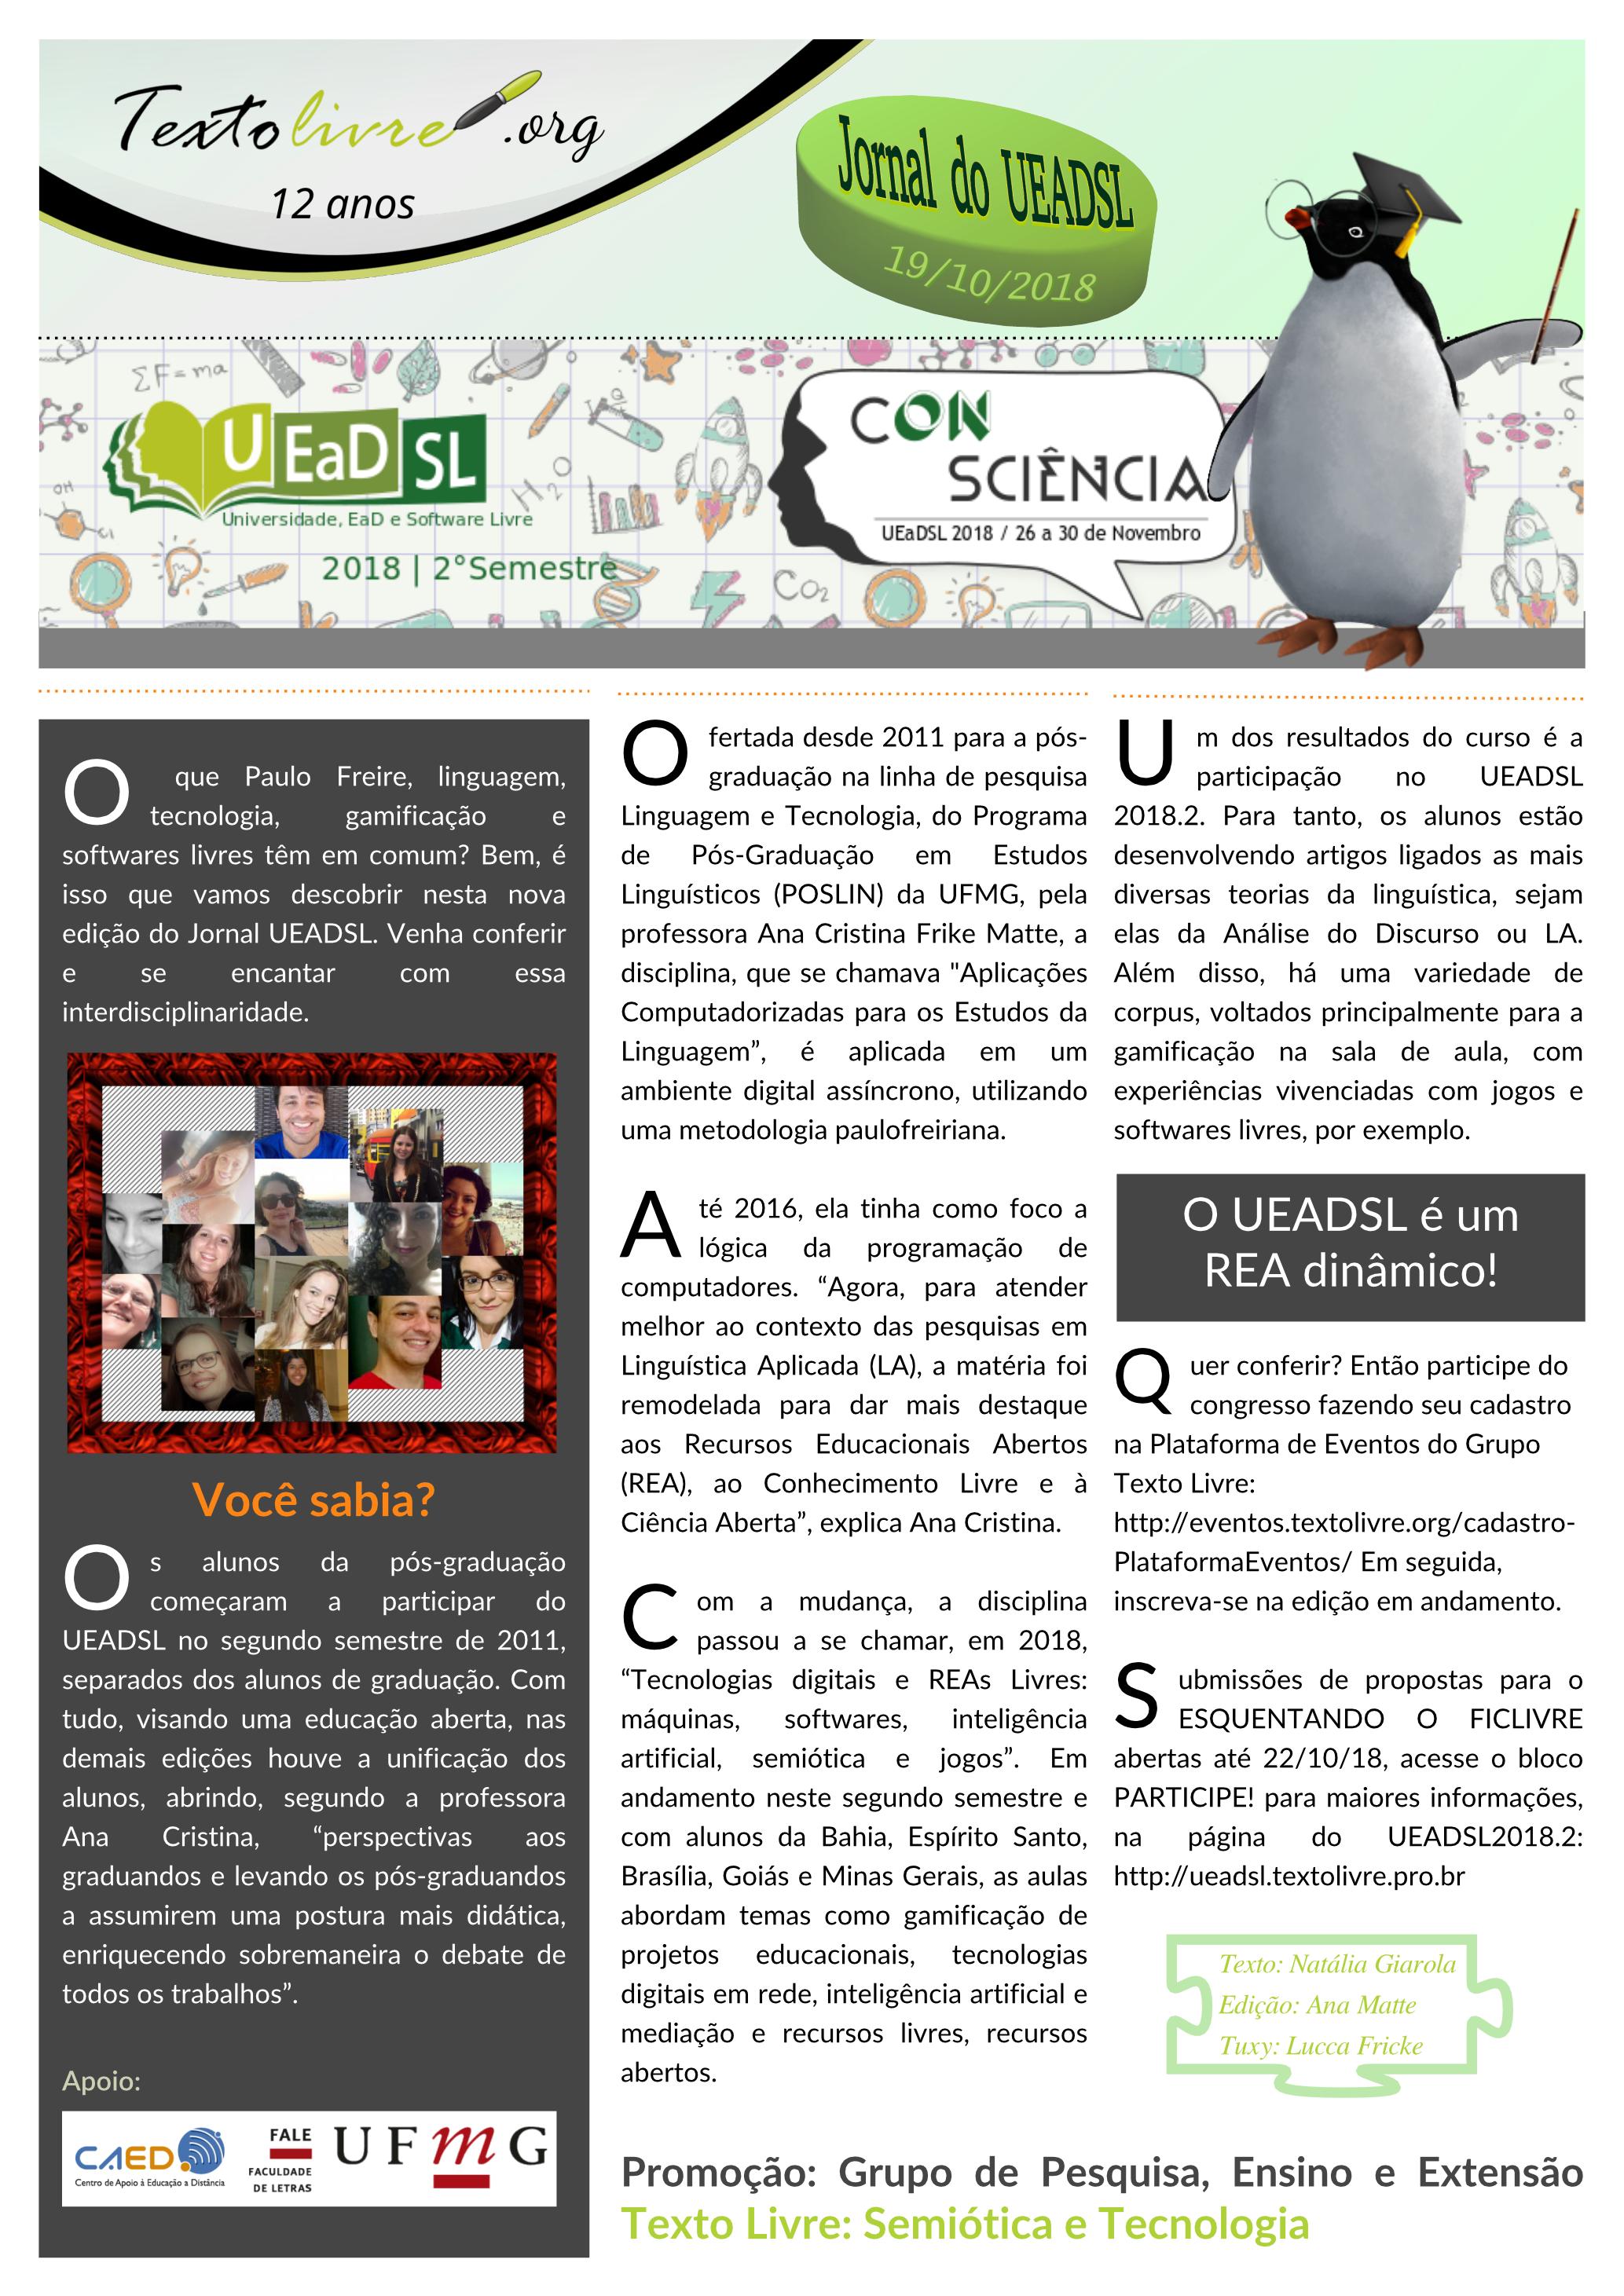 Jornal do UEADSL - disponível na página do CAED/UFMG https://www.ufmg.br/ead/index.php/4835-2/